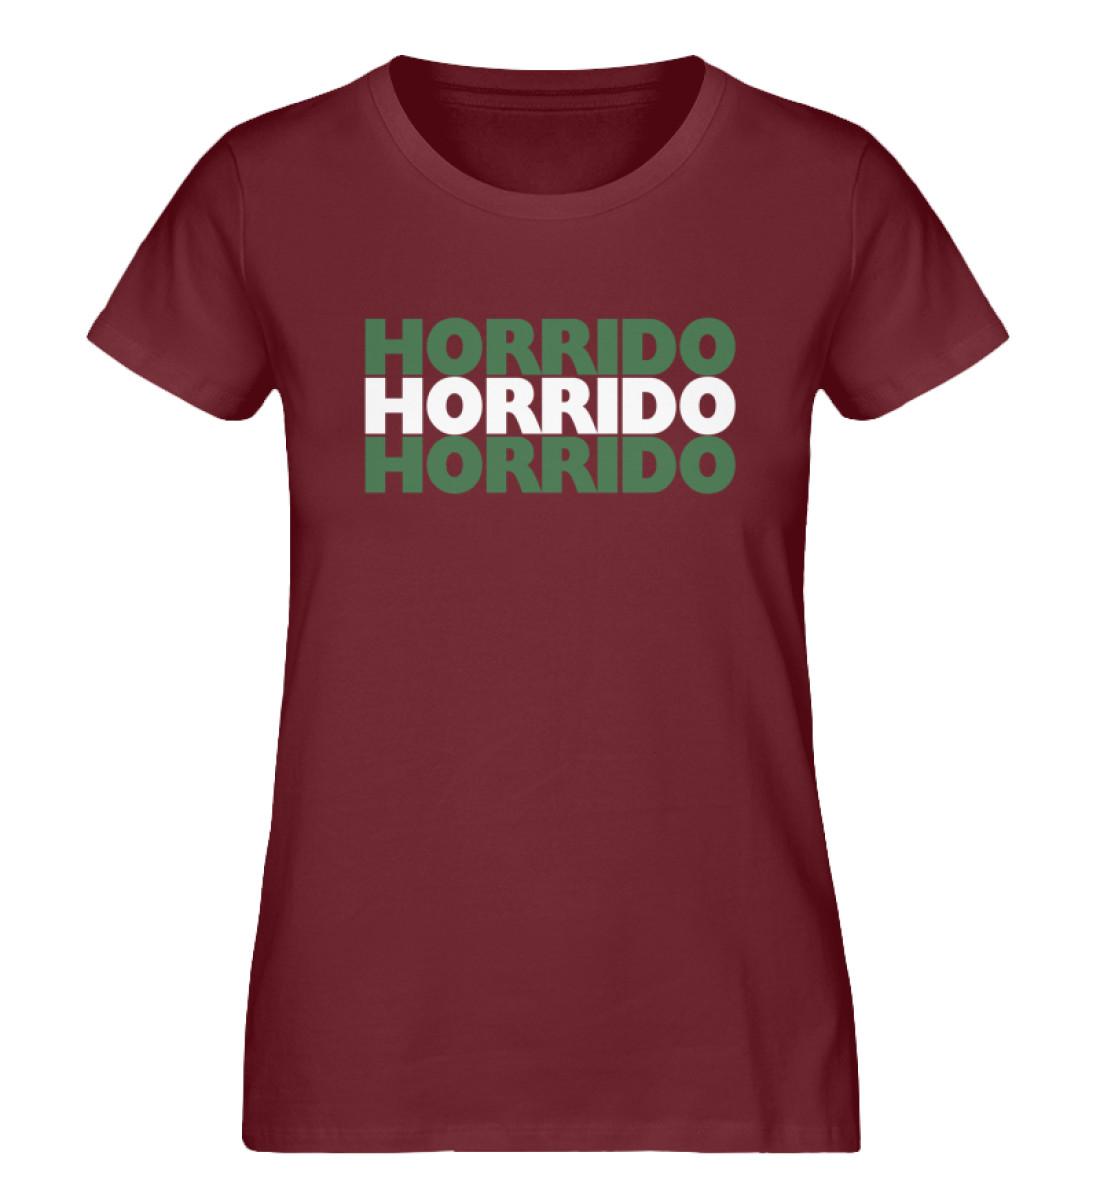 Horrido - Damen Premium Organic Shirt-6883